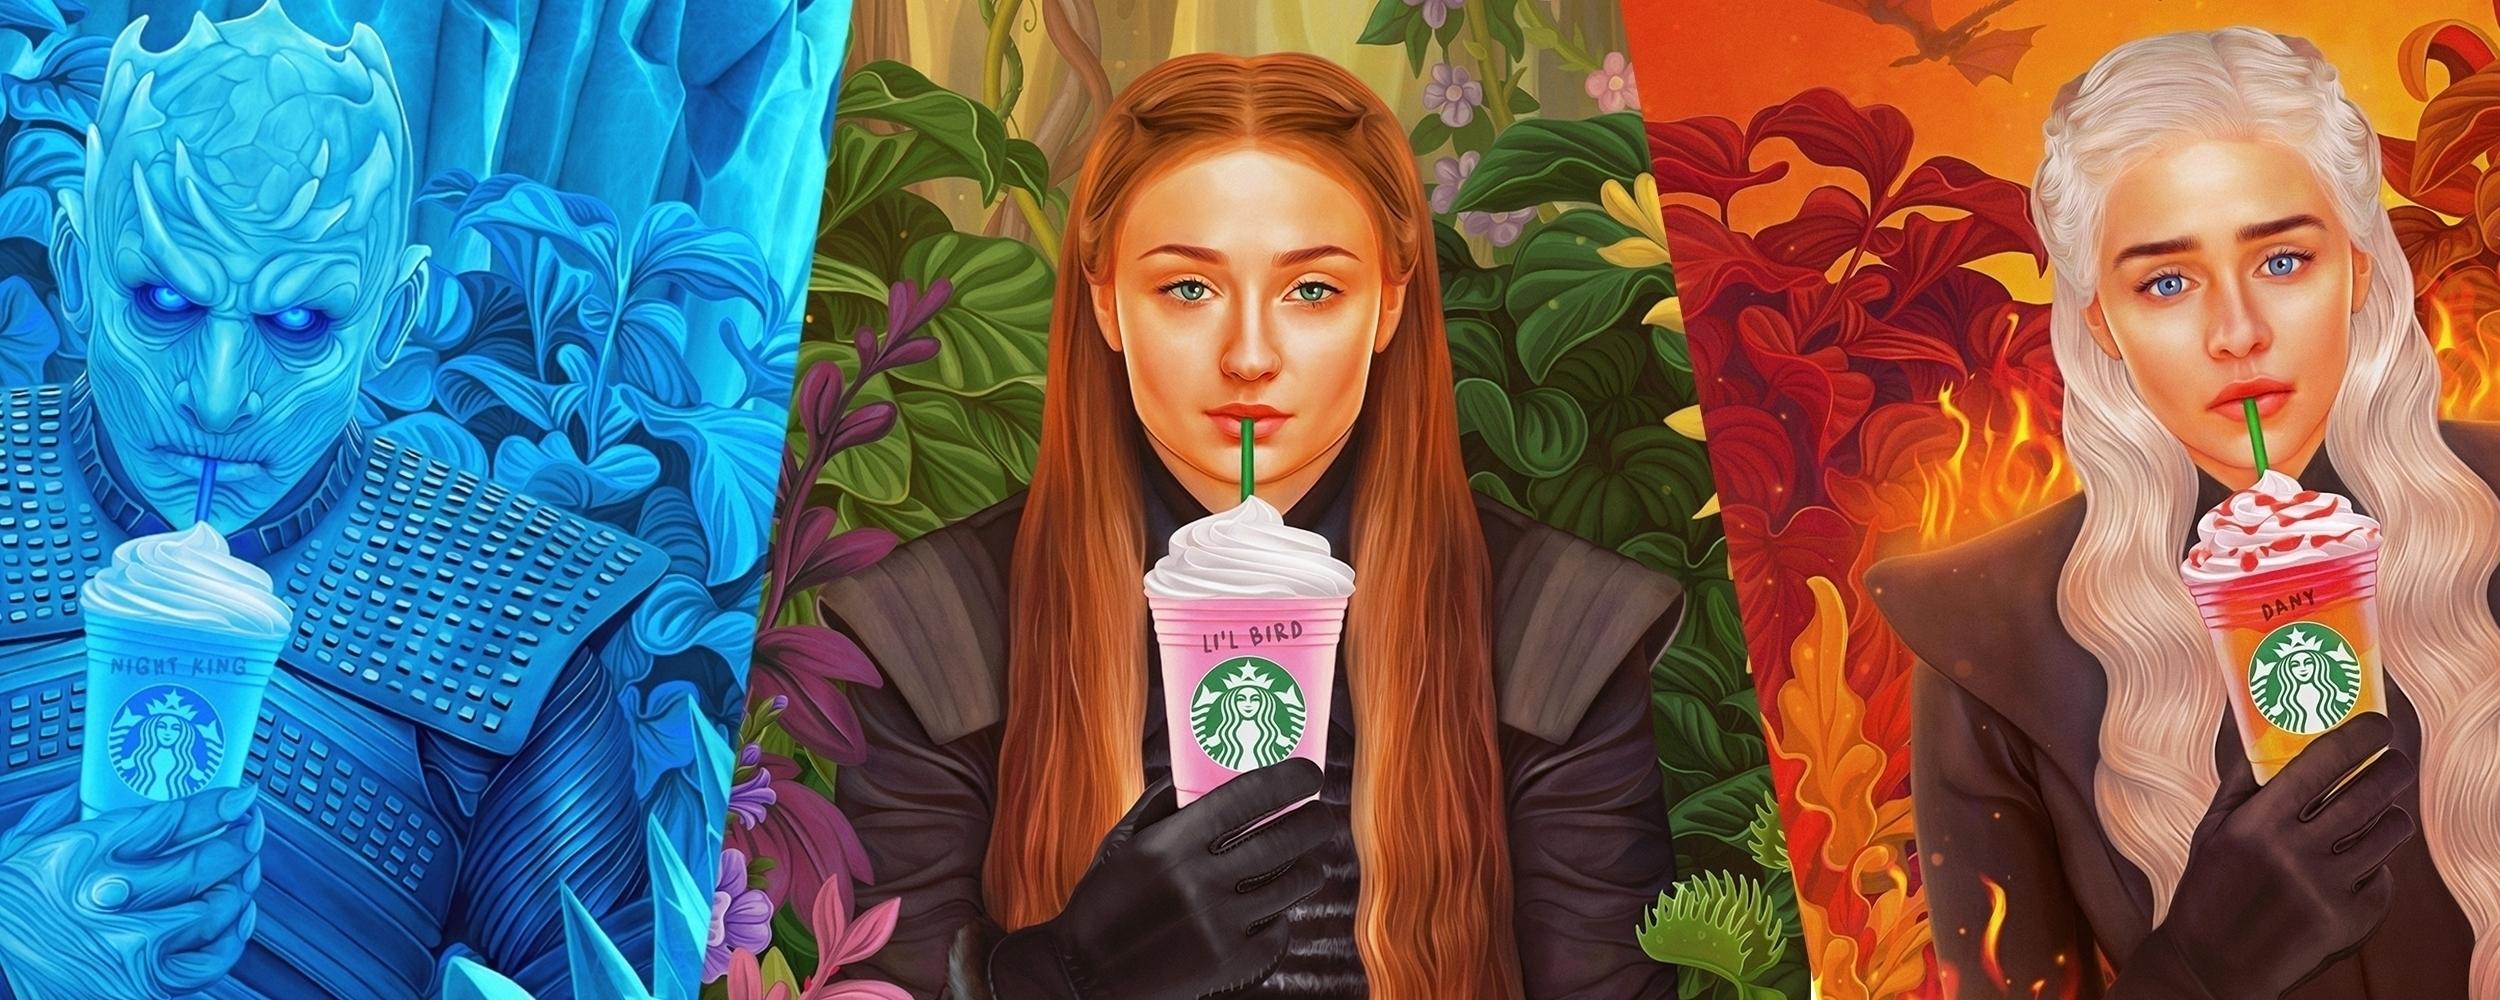 Pop-Culture Artist Illustrator - elloblog | ello